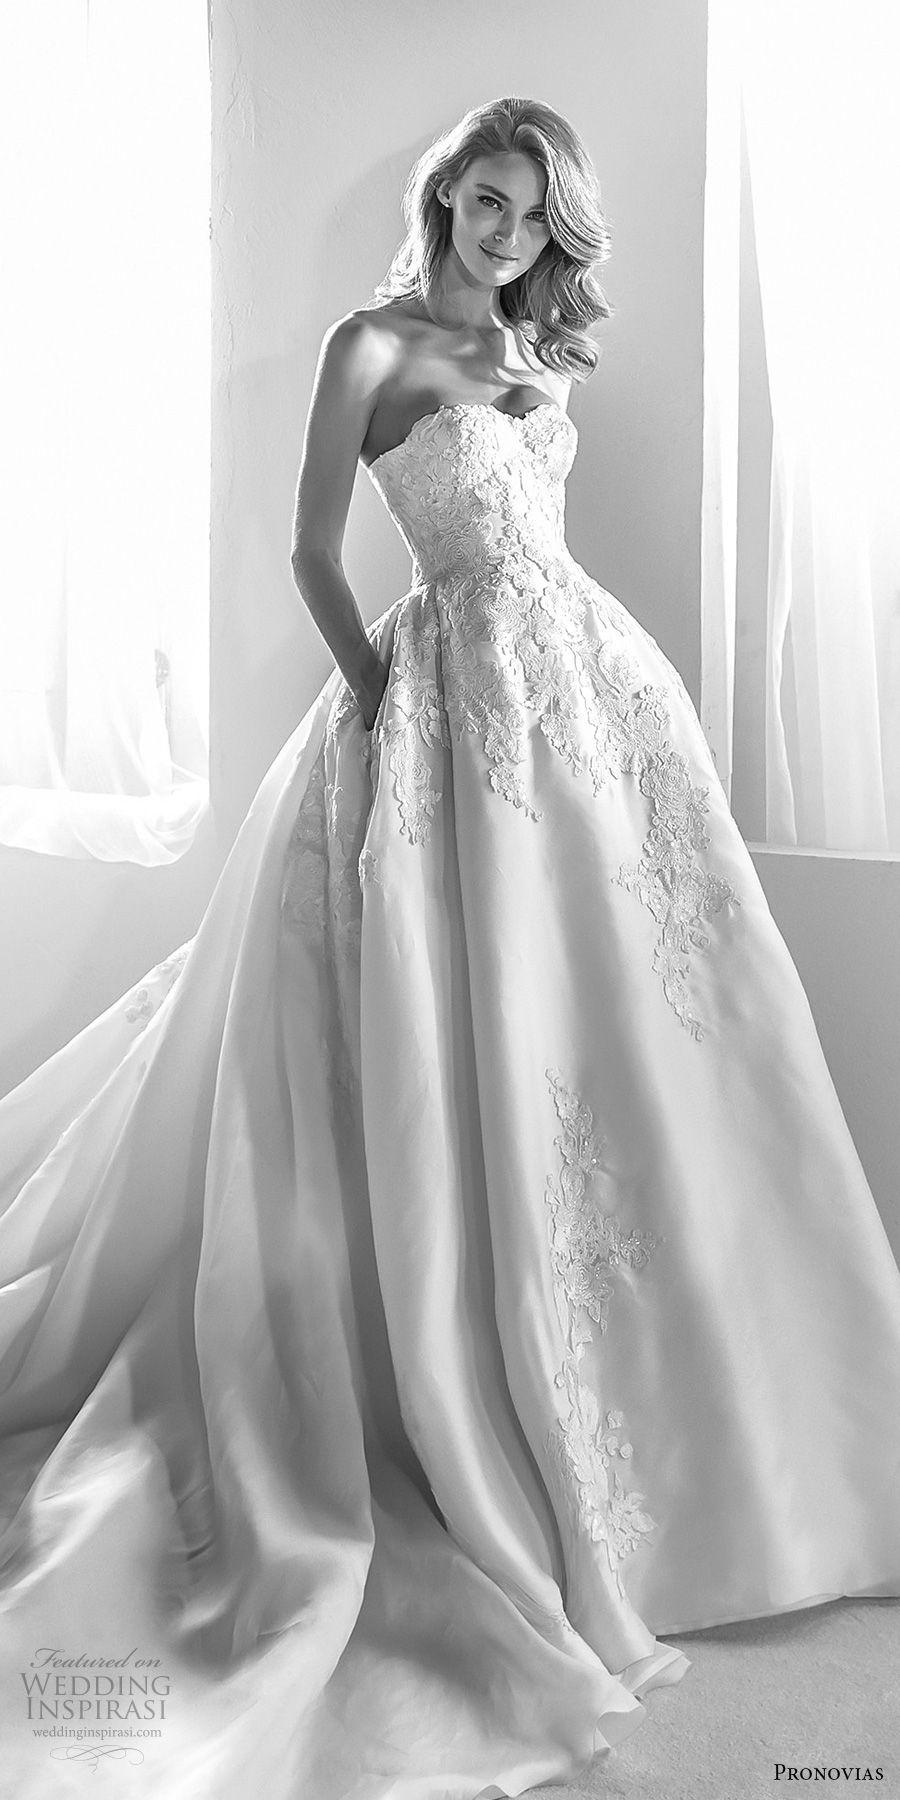 Atelier pronovias wedding dresses wedding dresses pinterest